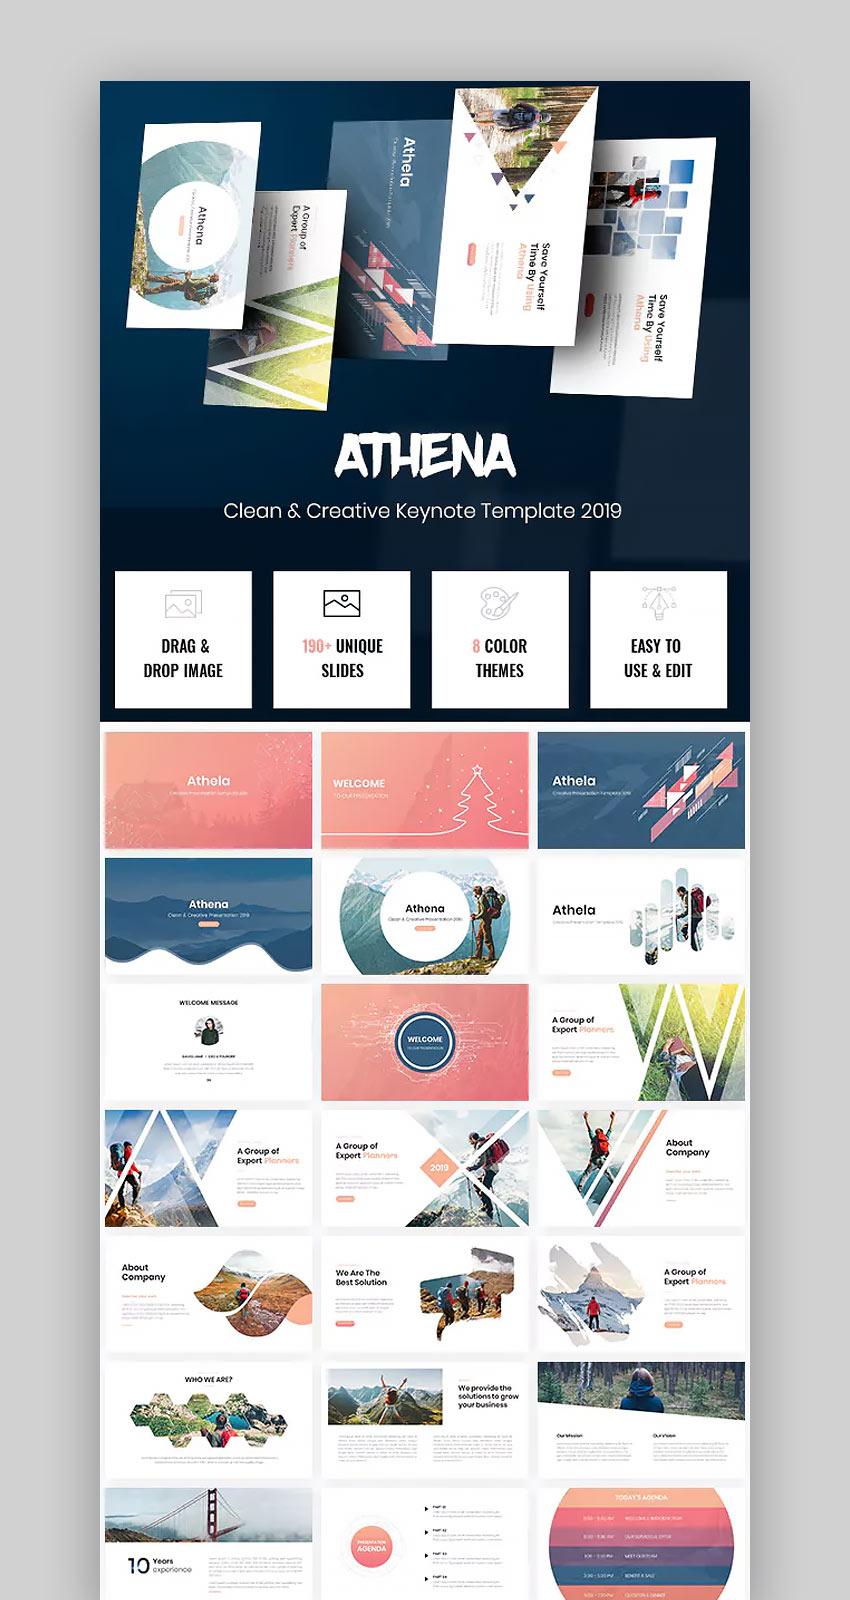 Athena Creative Keynote Template 2019